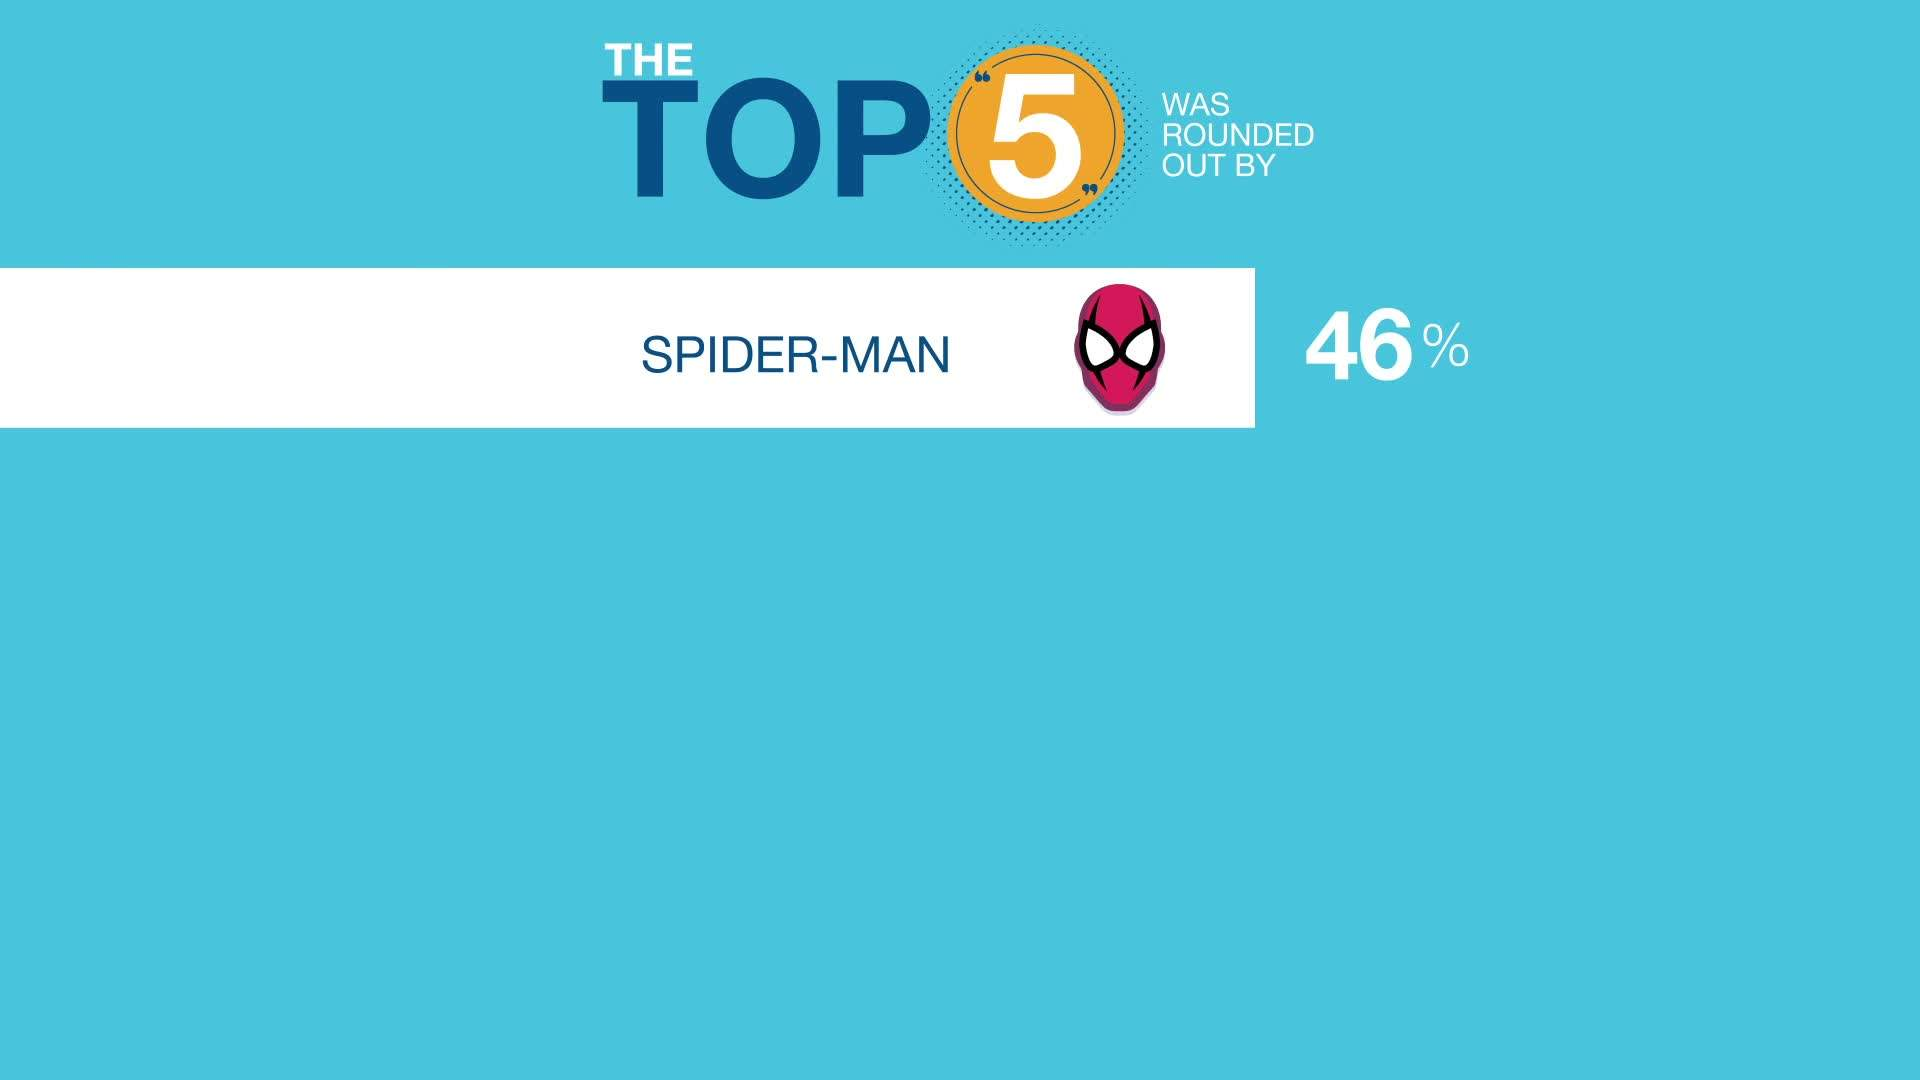 Americans reveal their favorite superhero (hint: it isn't Captain America)